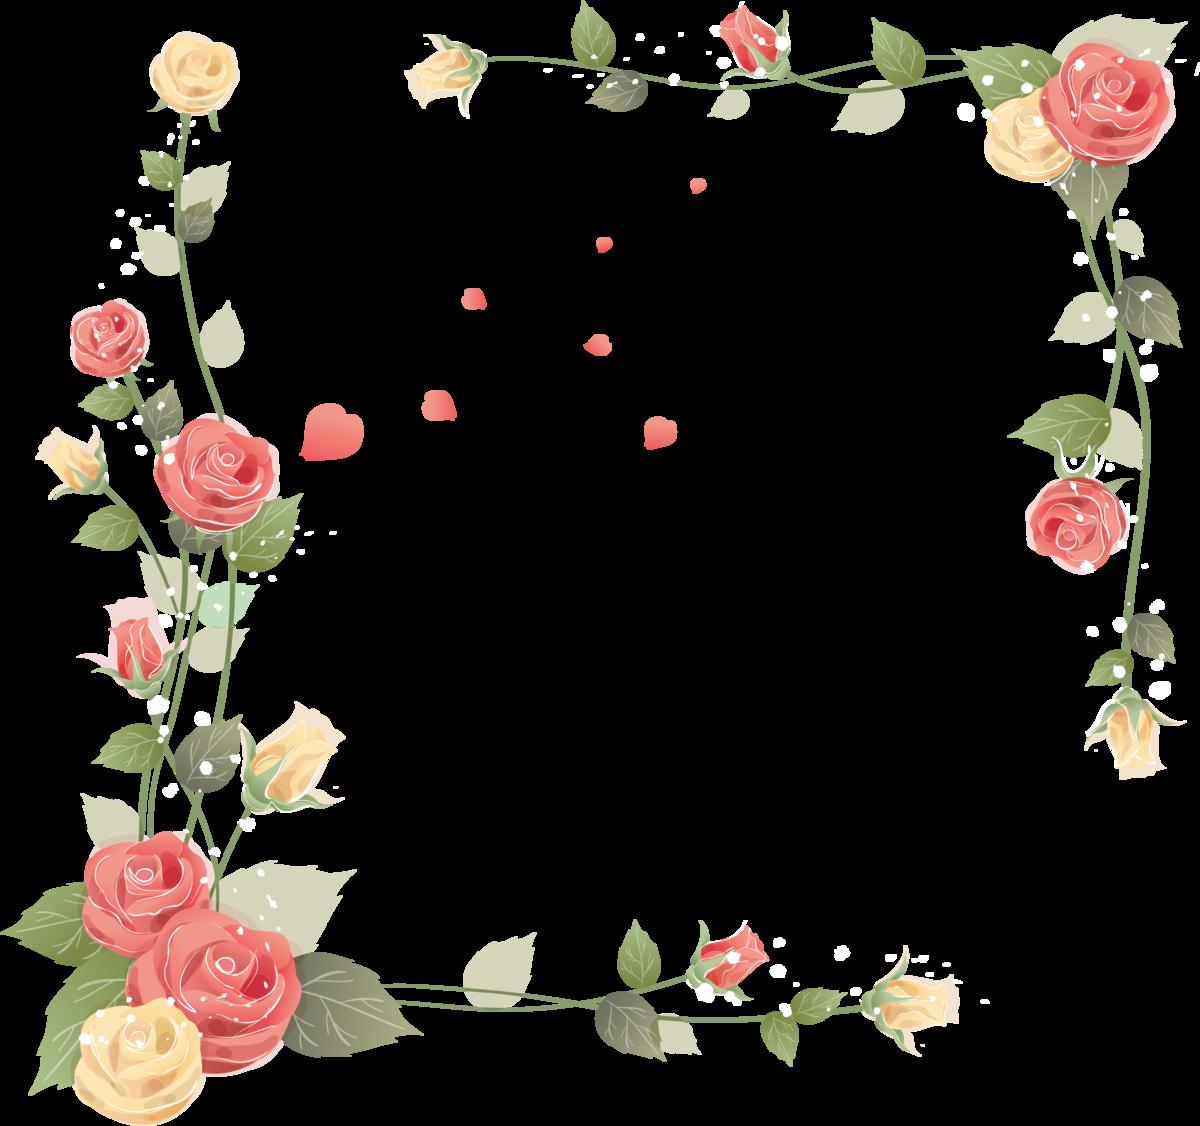 Открытка с цветами в углу, планета